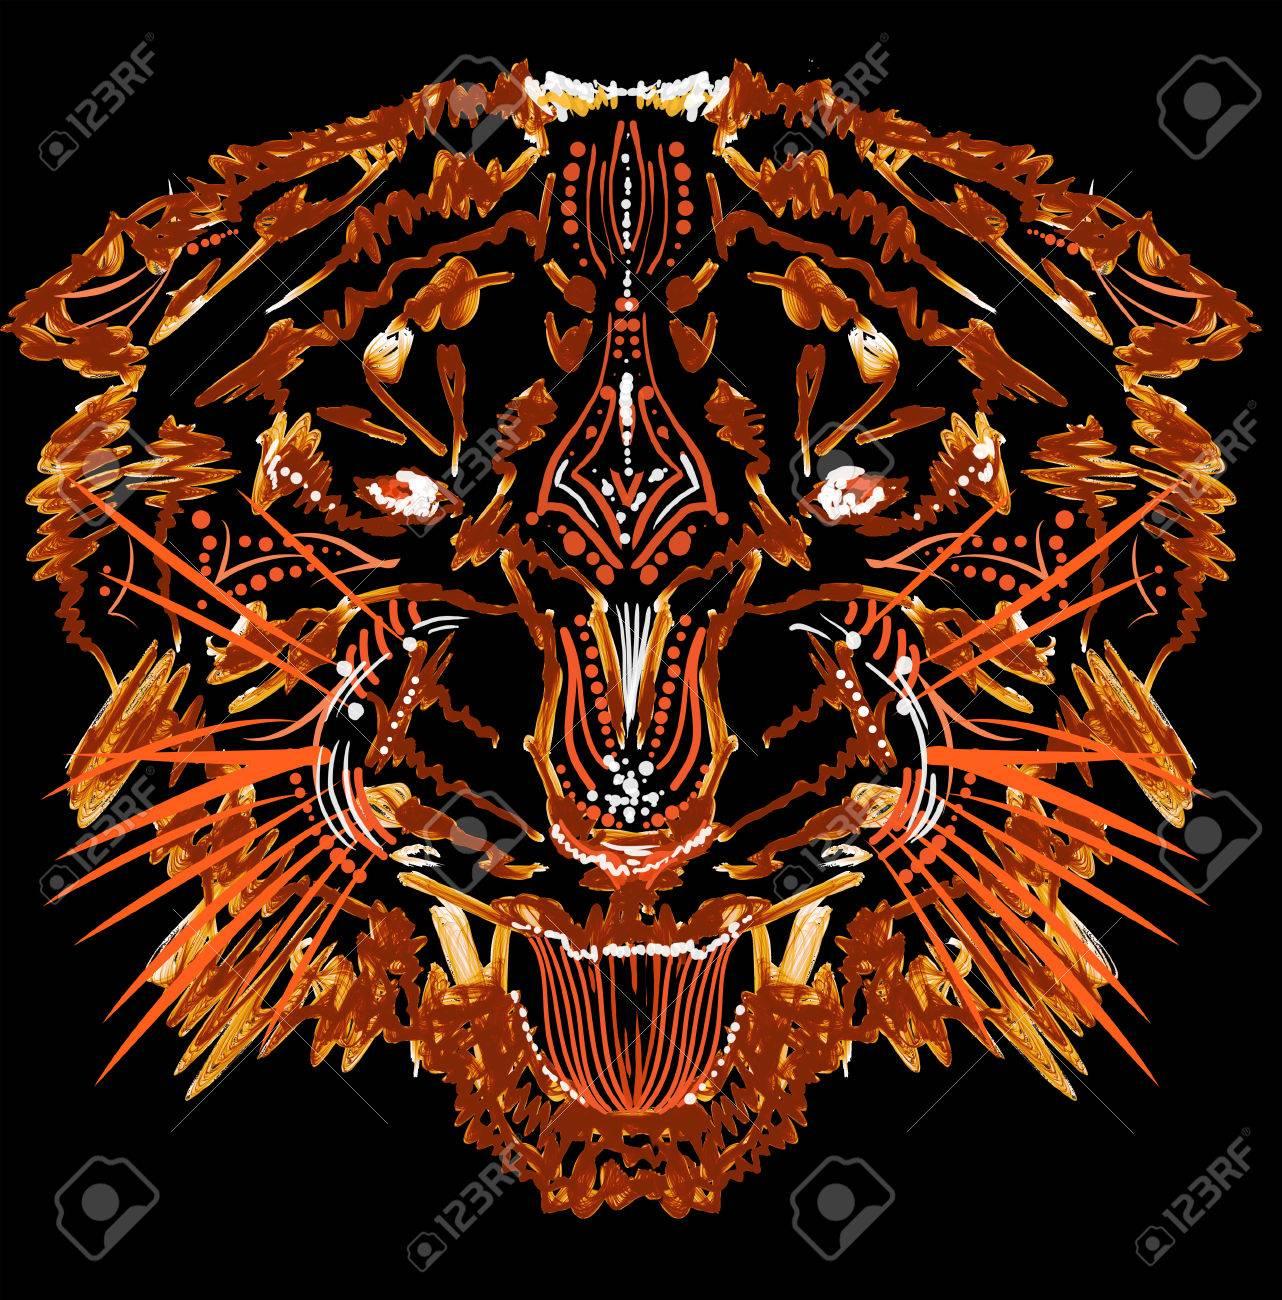 Shirt design on photoshop - Grinning Flame Tiger Photoshop Illustration For T Shirt Design Stock Illustration 24524221